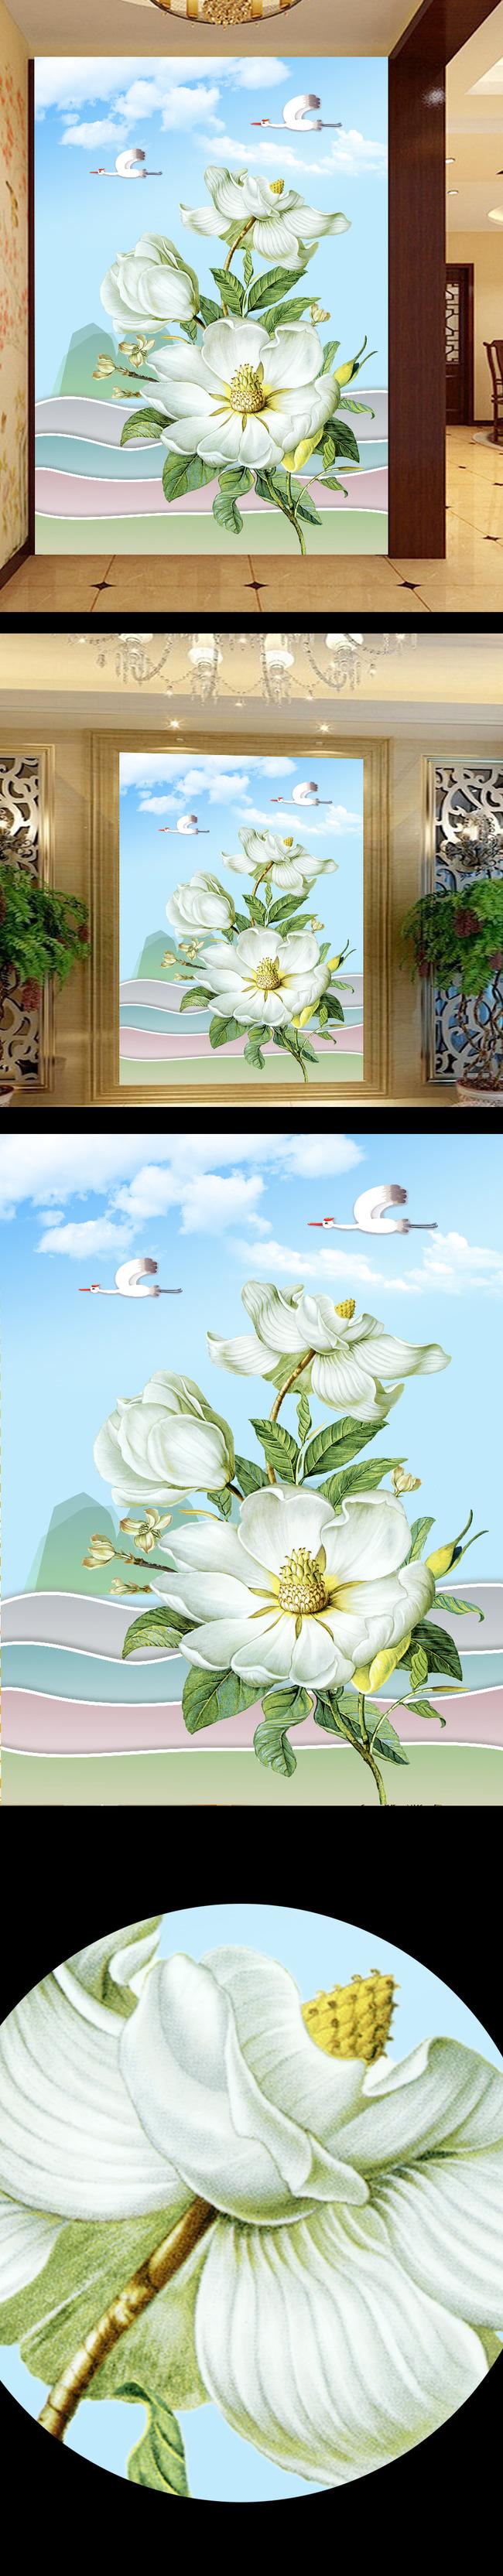 3d手绘花卉玄关背景墙 白花天空天鹅白云 含笑花 花卉 山水 古典 现代